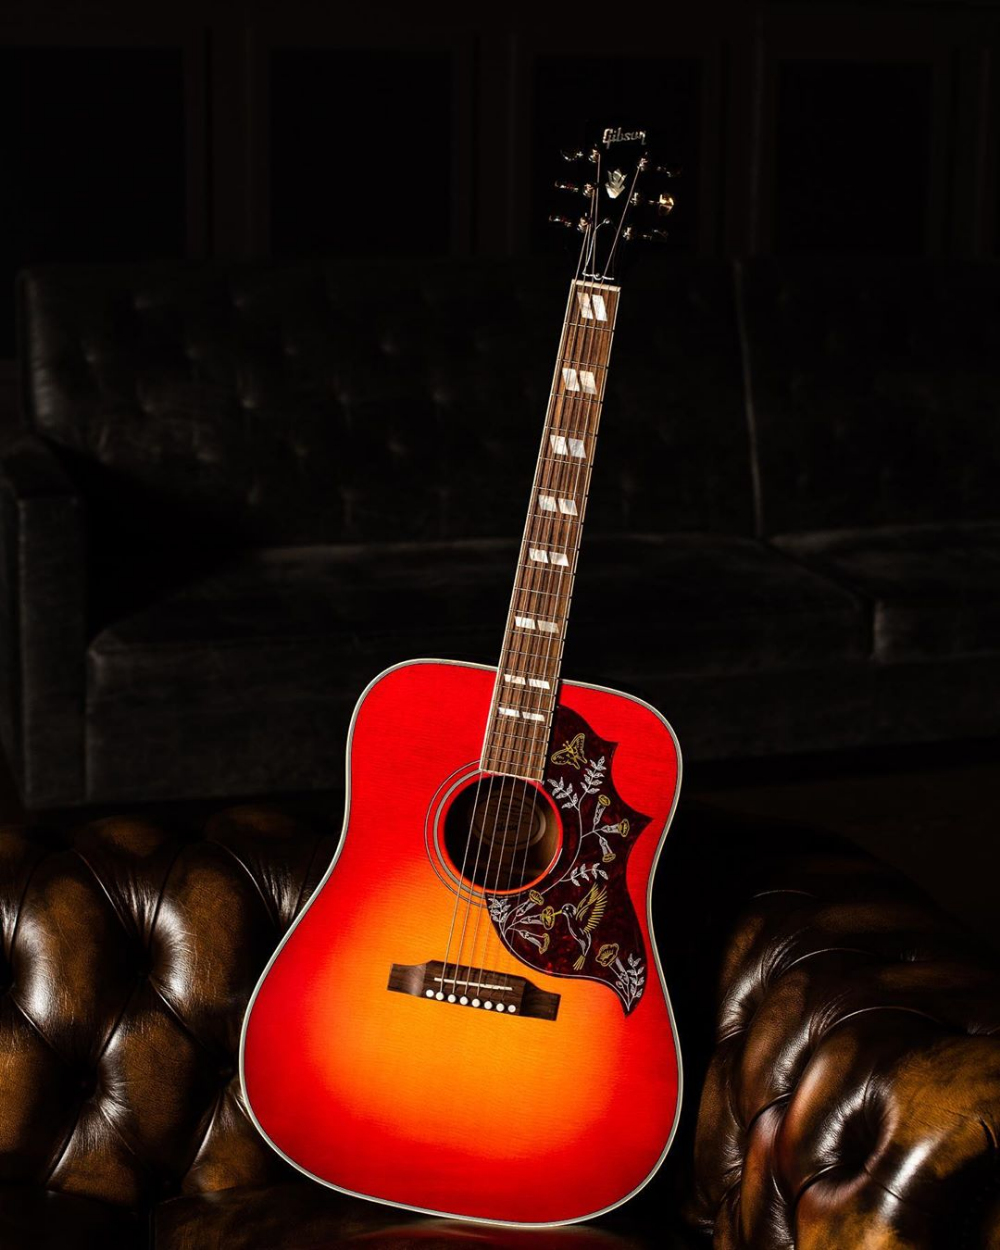 Gibson Gibsonguitar Gibson Hummingbird Dreadnought Acoustic Gibson Acoustic Epiphone Guitars Electric Guitar Design